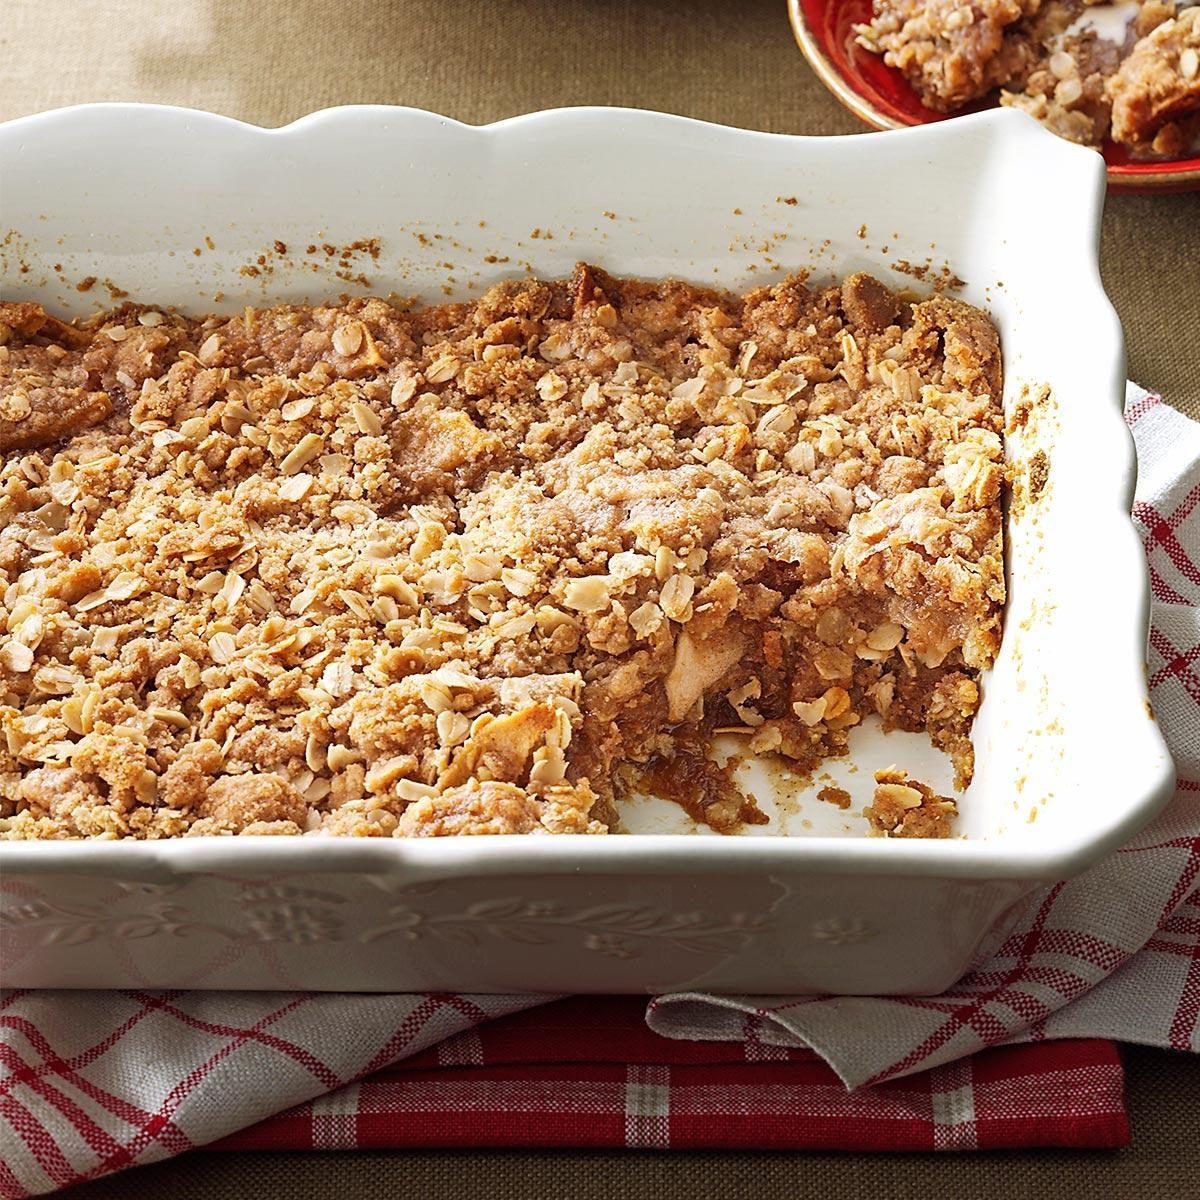 Two-Layered Apple Crisp Recipe